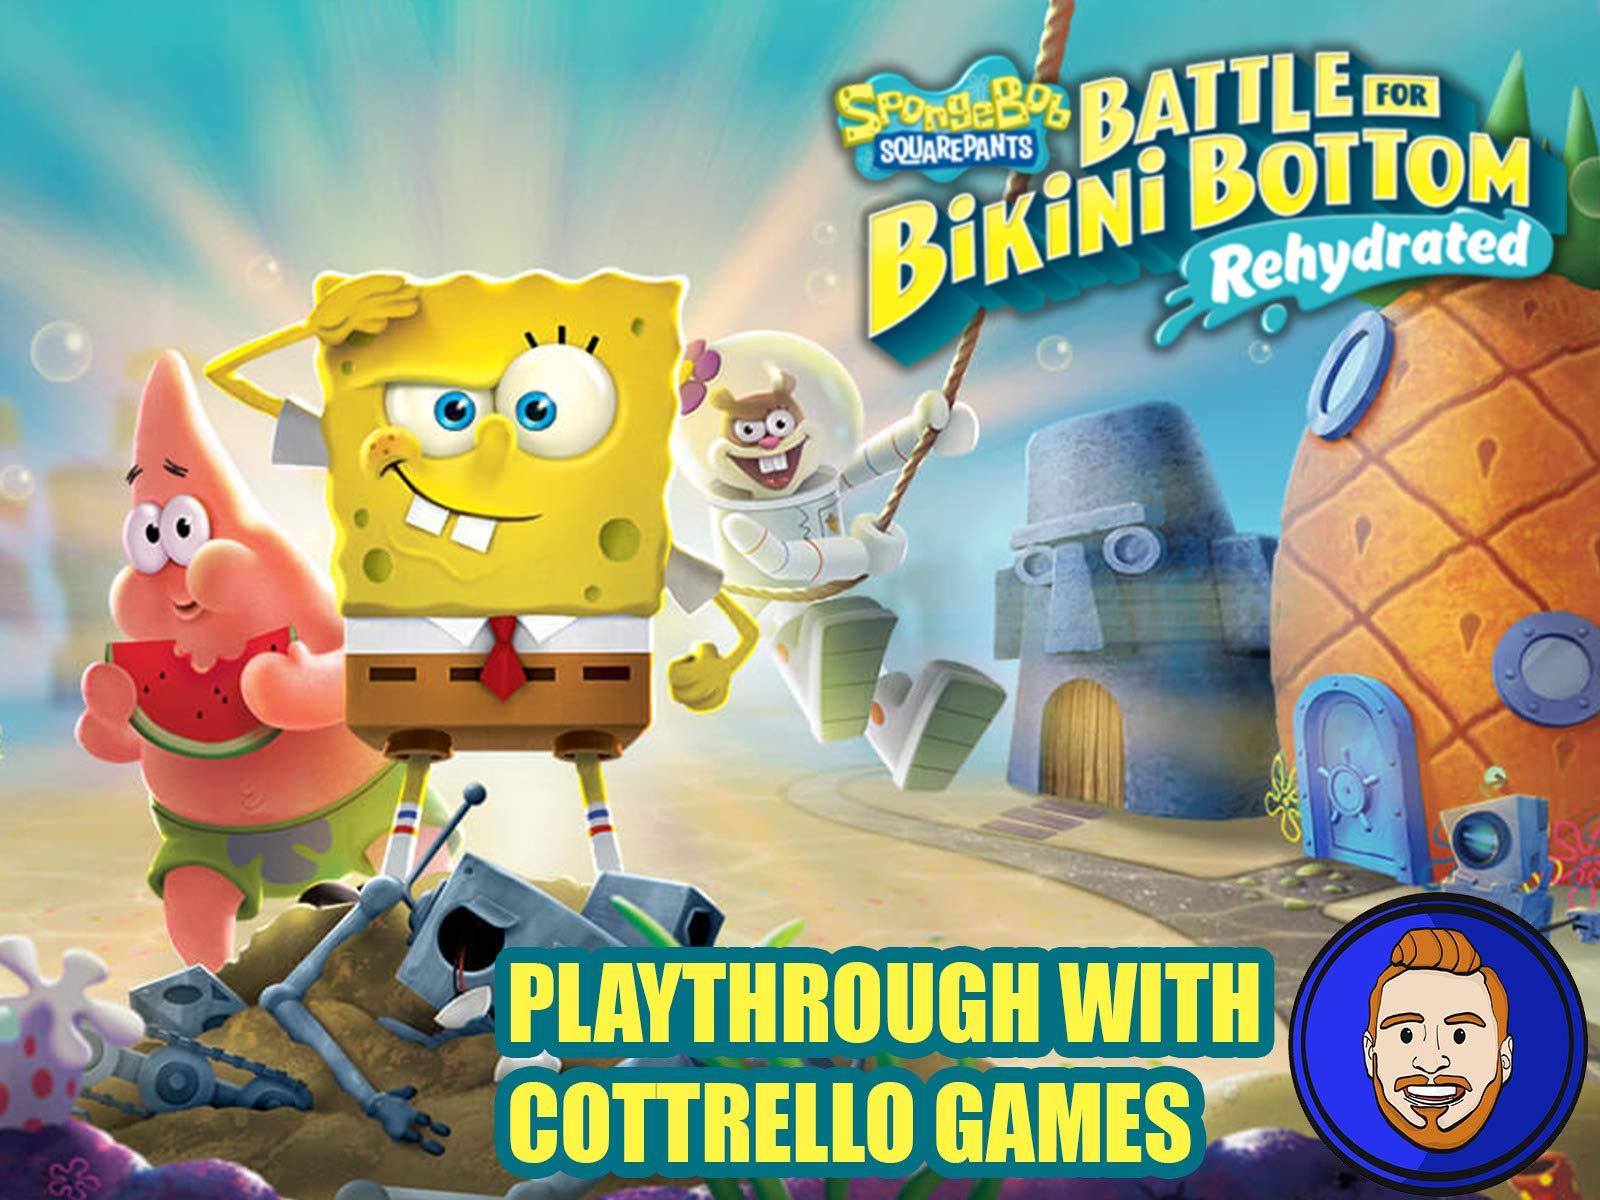 SpongeBob SquarePants: Battle for Bikini Bottom - Rehydrated Playthrough with Cottrello Games - Season 1